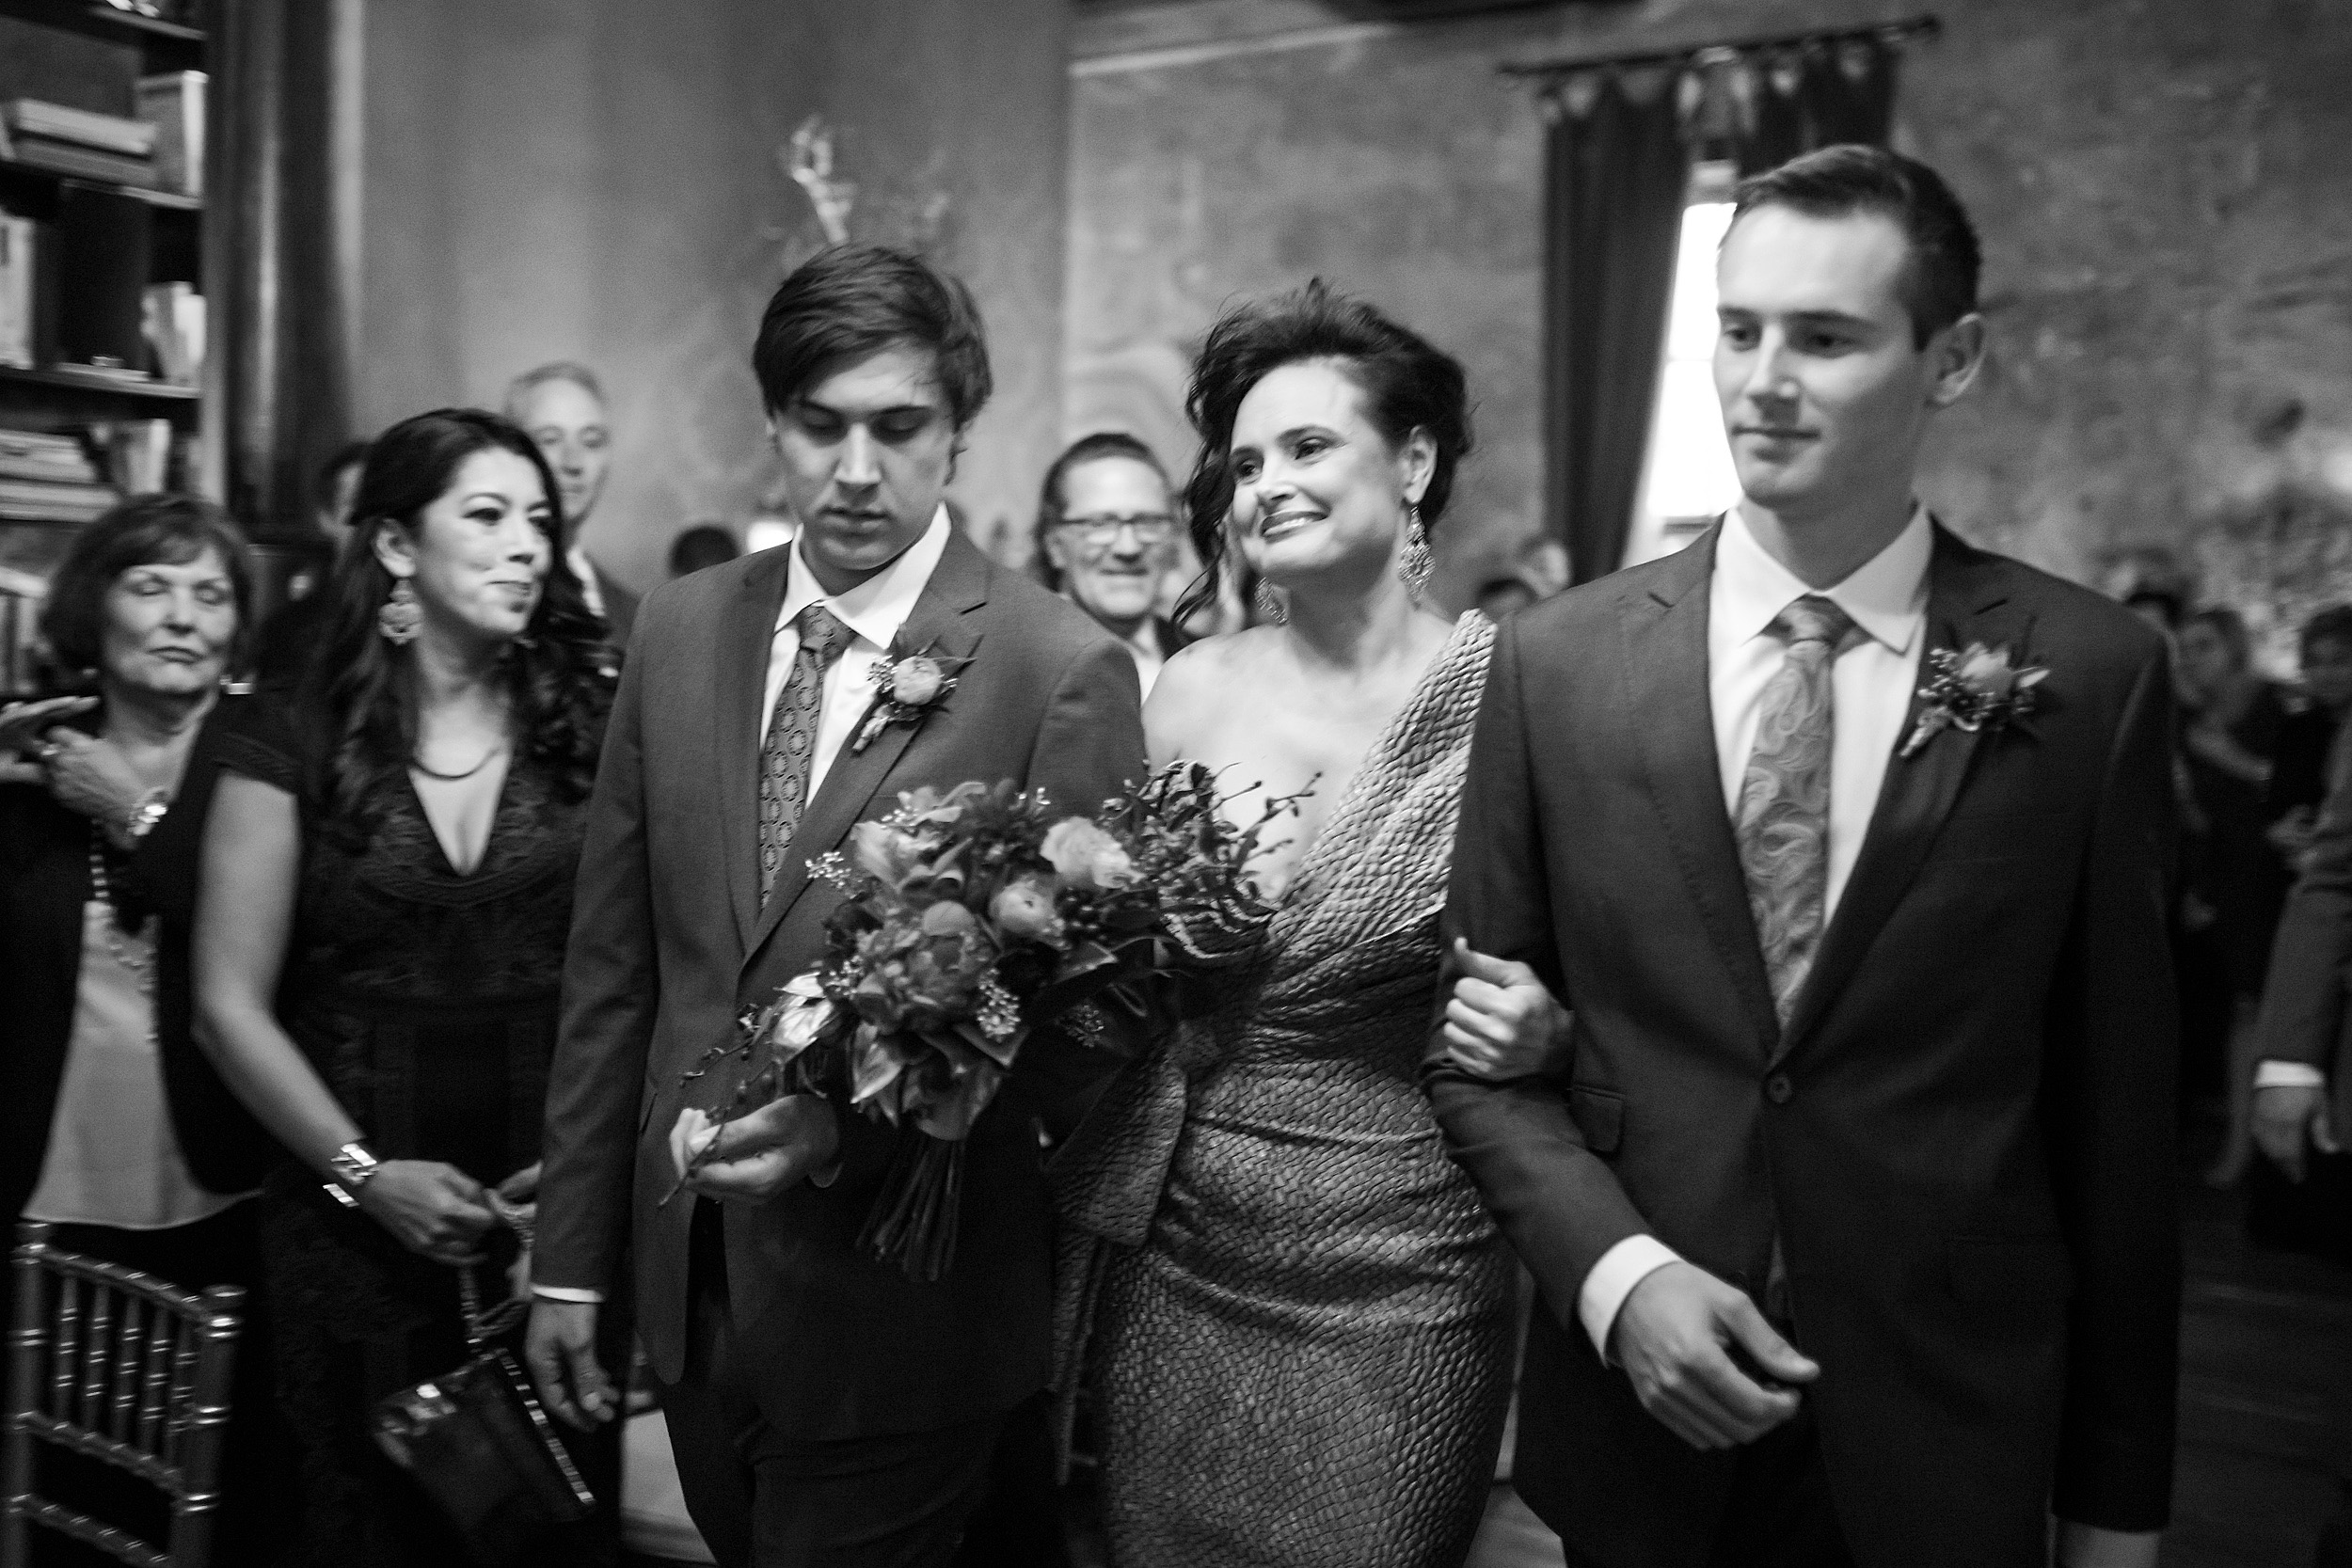 palazzo-lavaca-wedding-austin-42.jpg